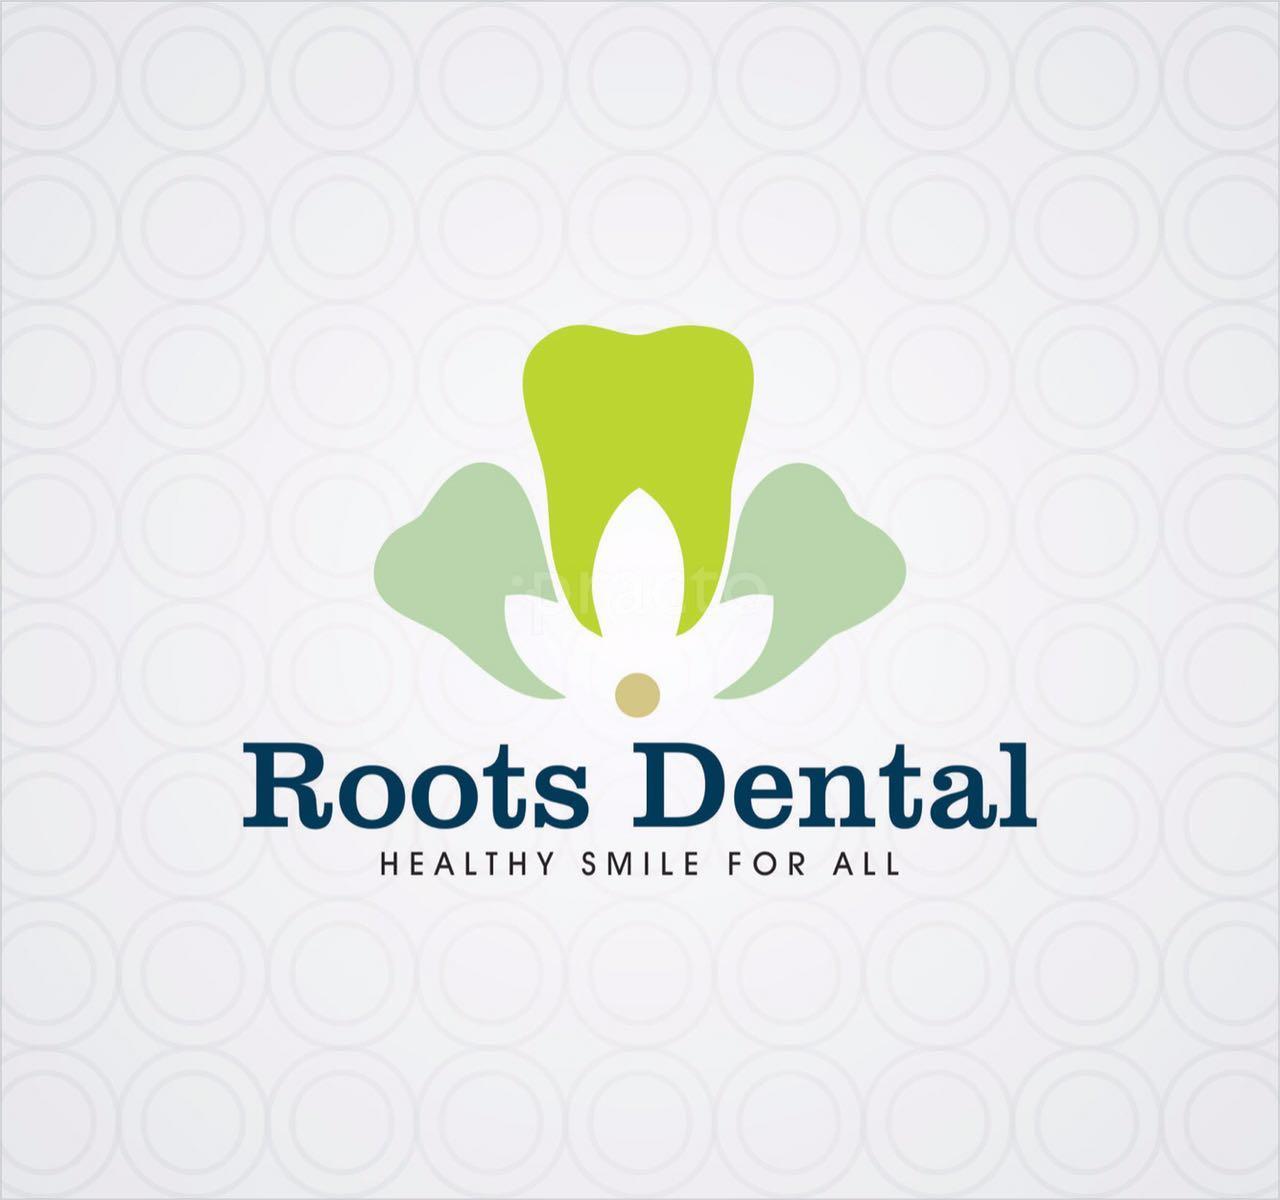 Roots Dental